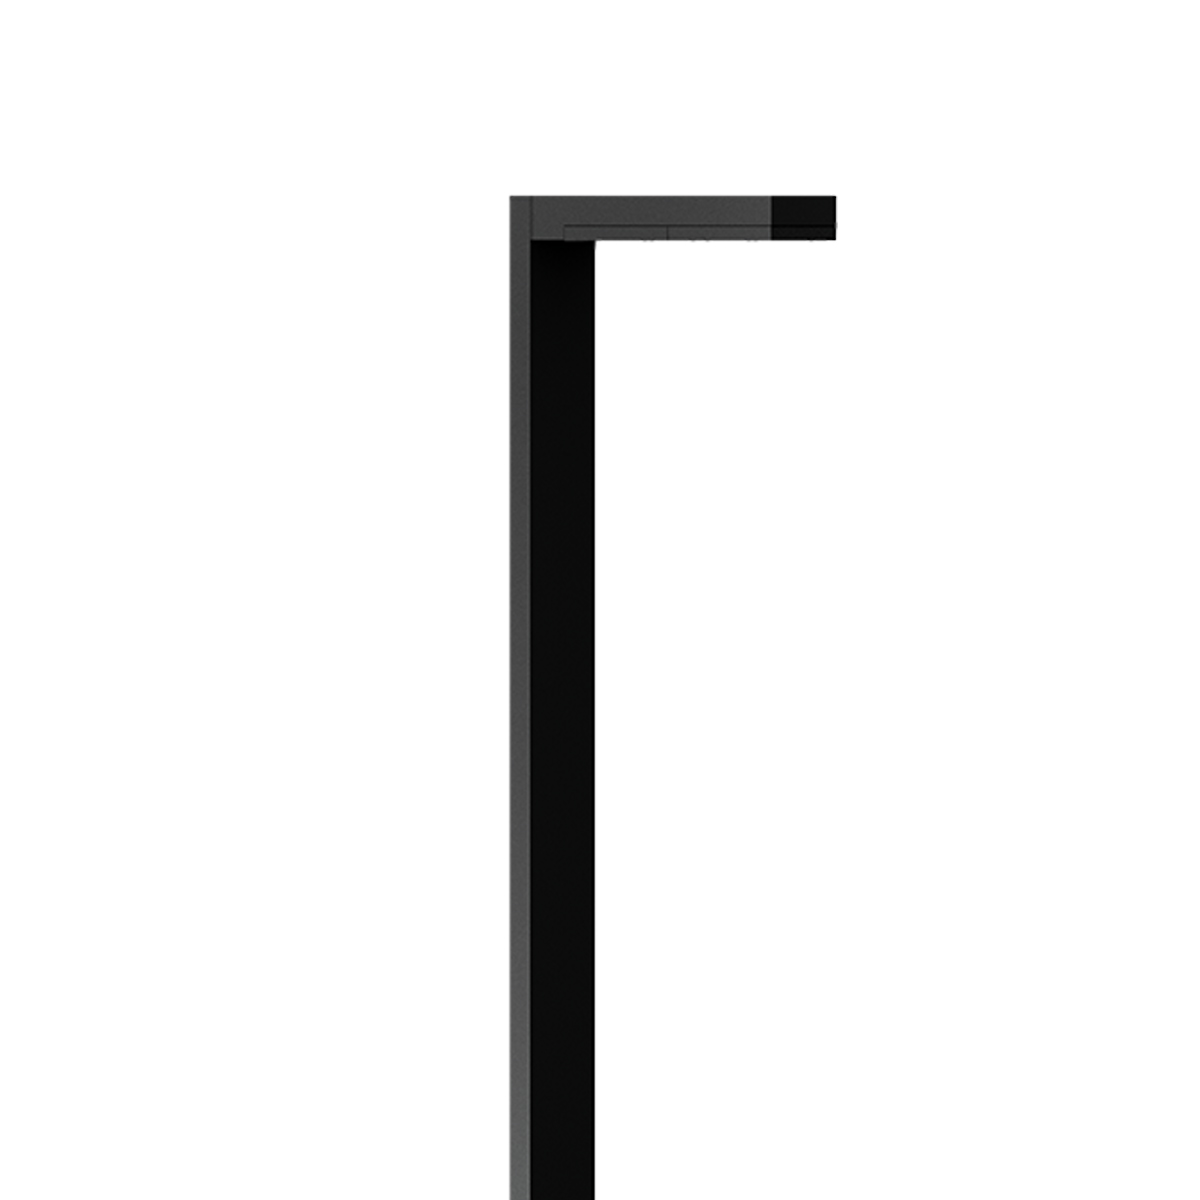 Light linear pt 3 prod 1200x1200